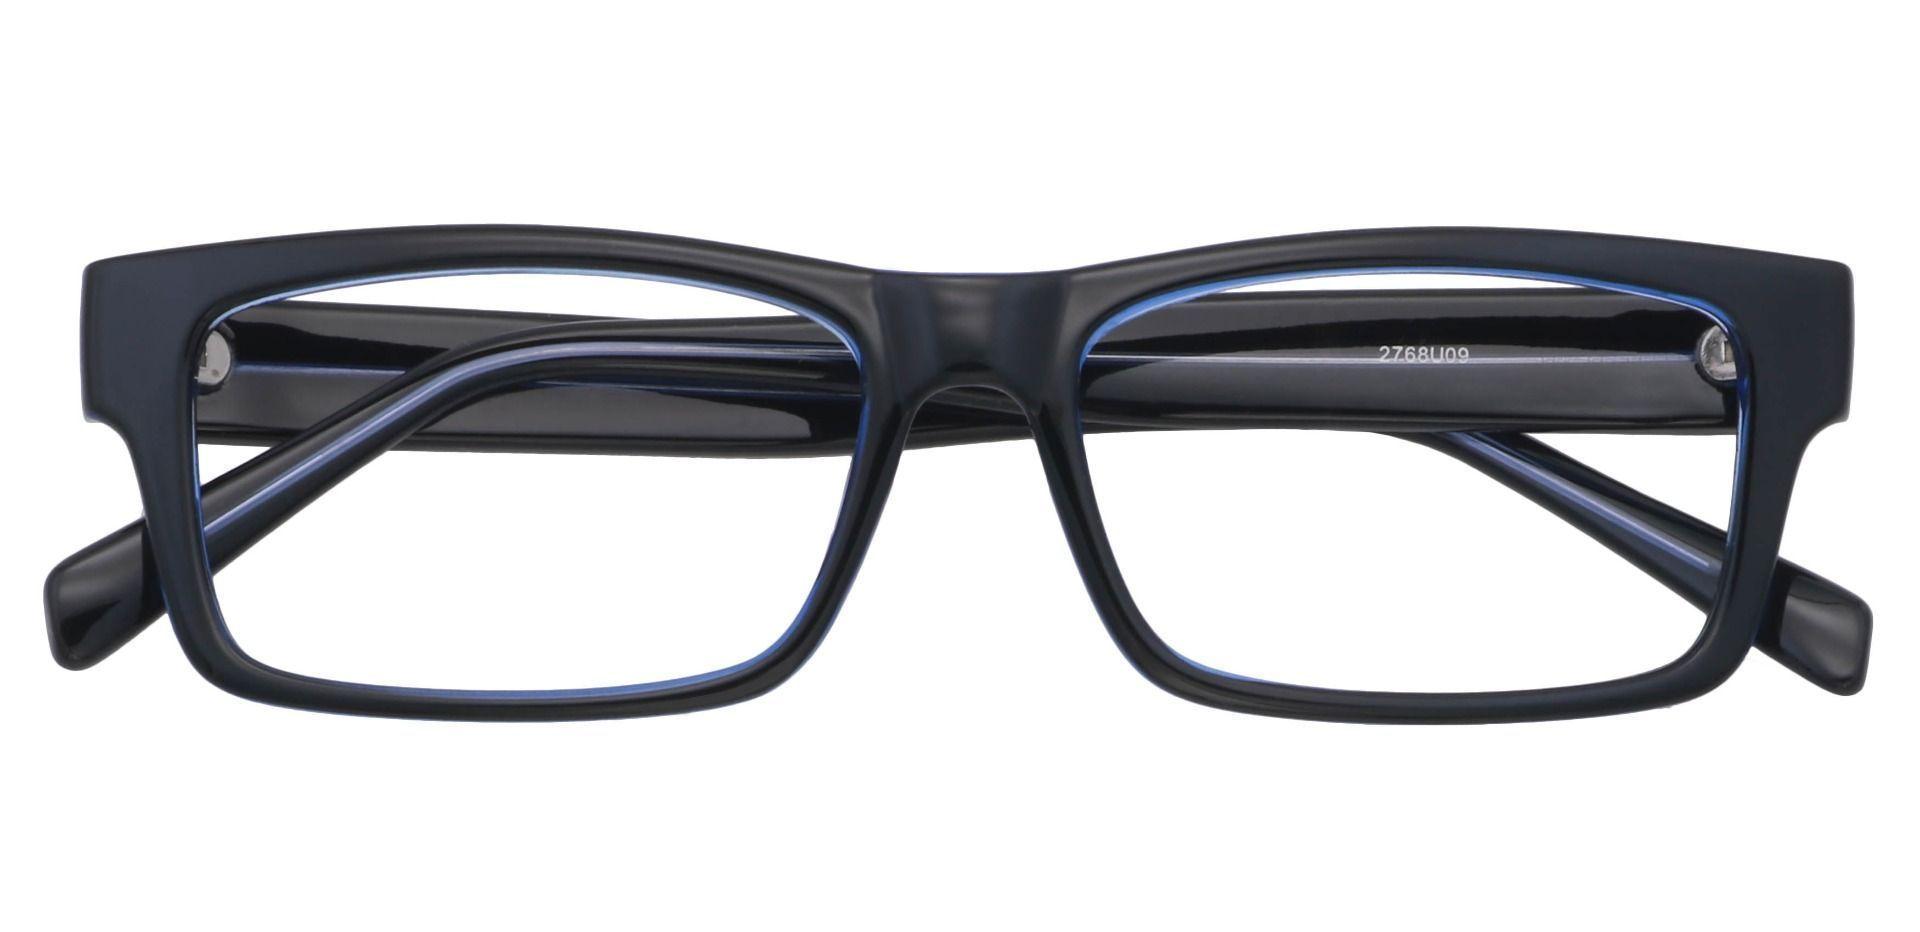 Eclipse Rectangle Prescription Glasses -  Black/blue